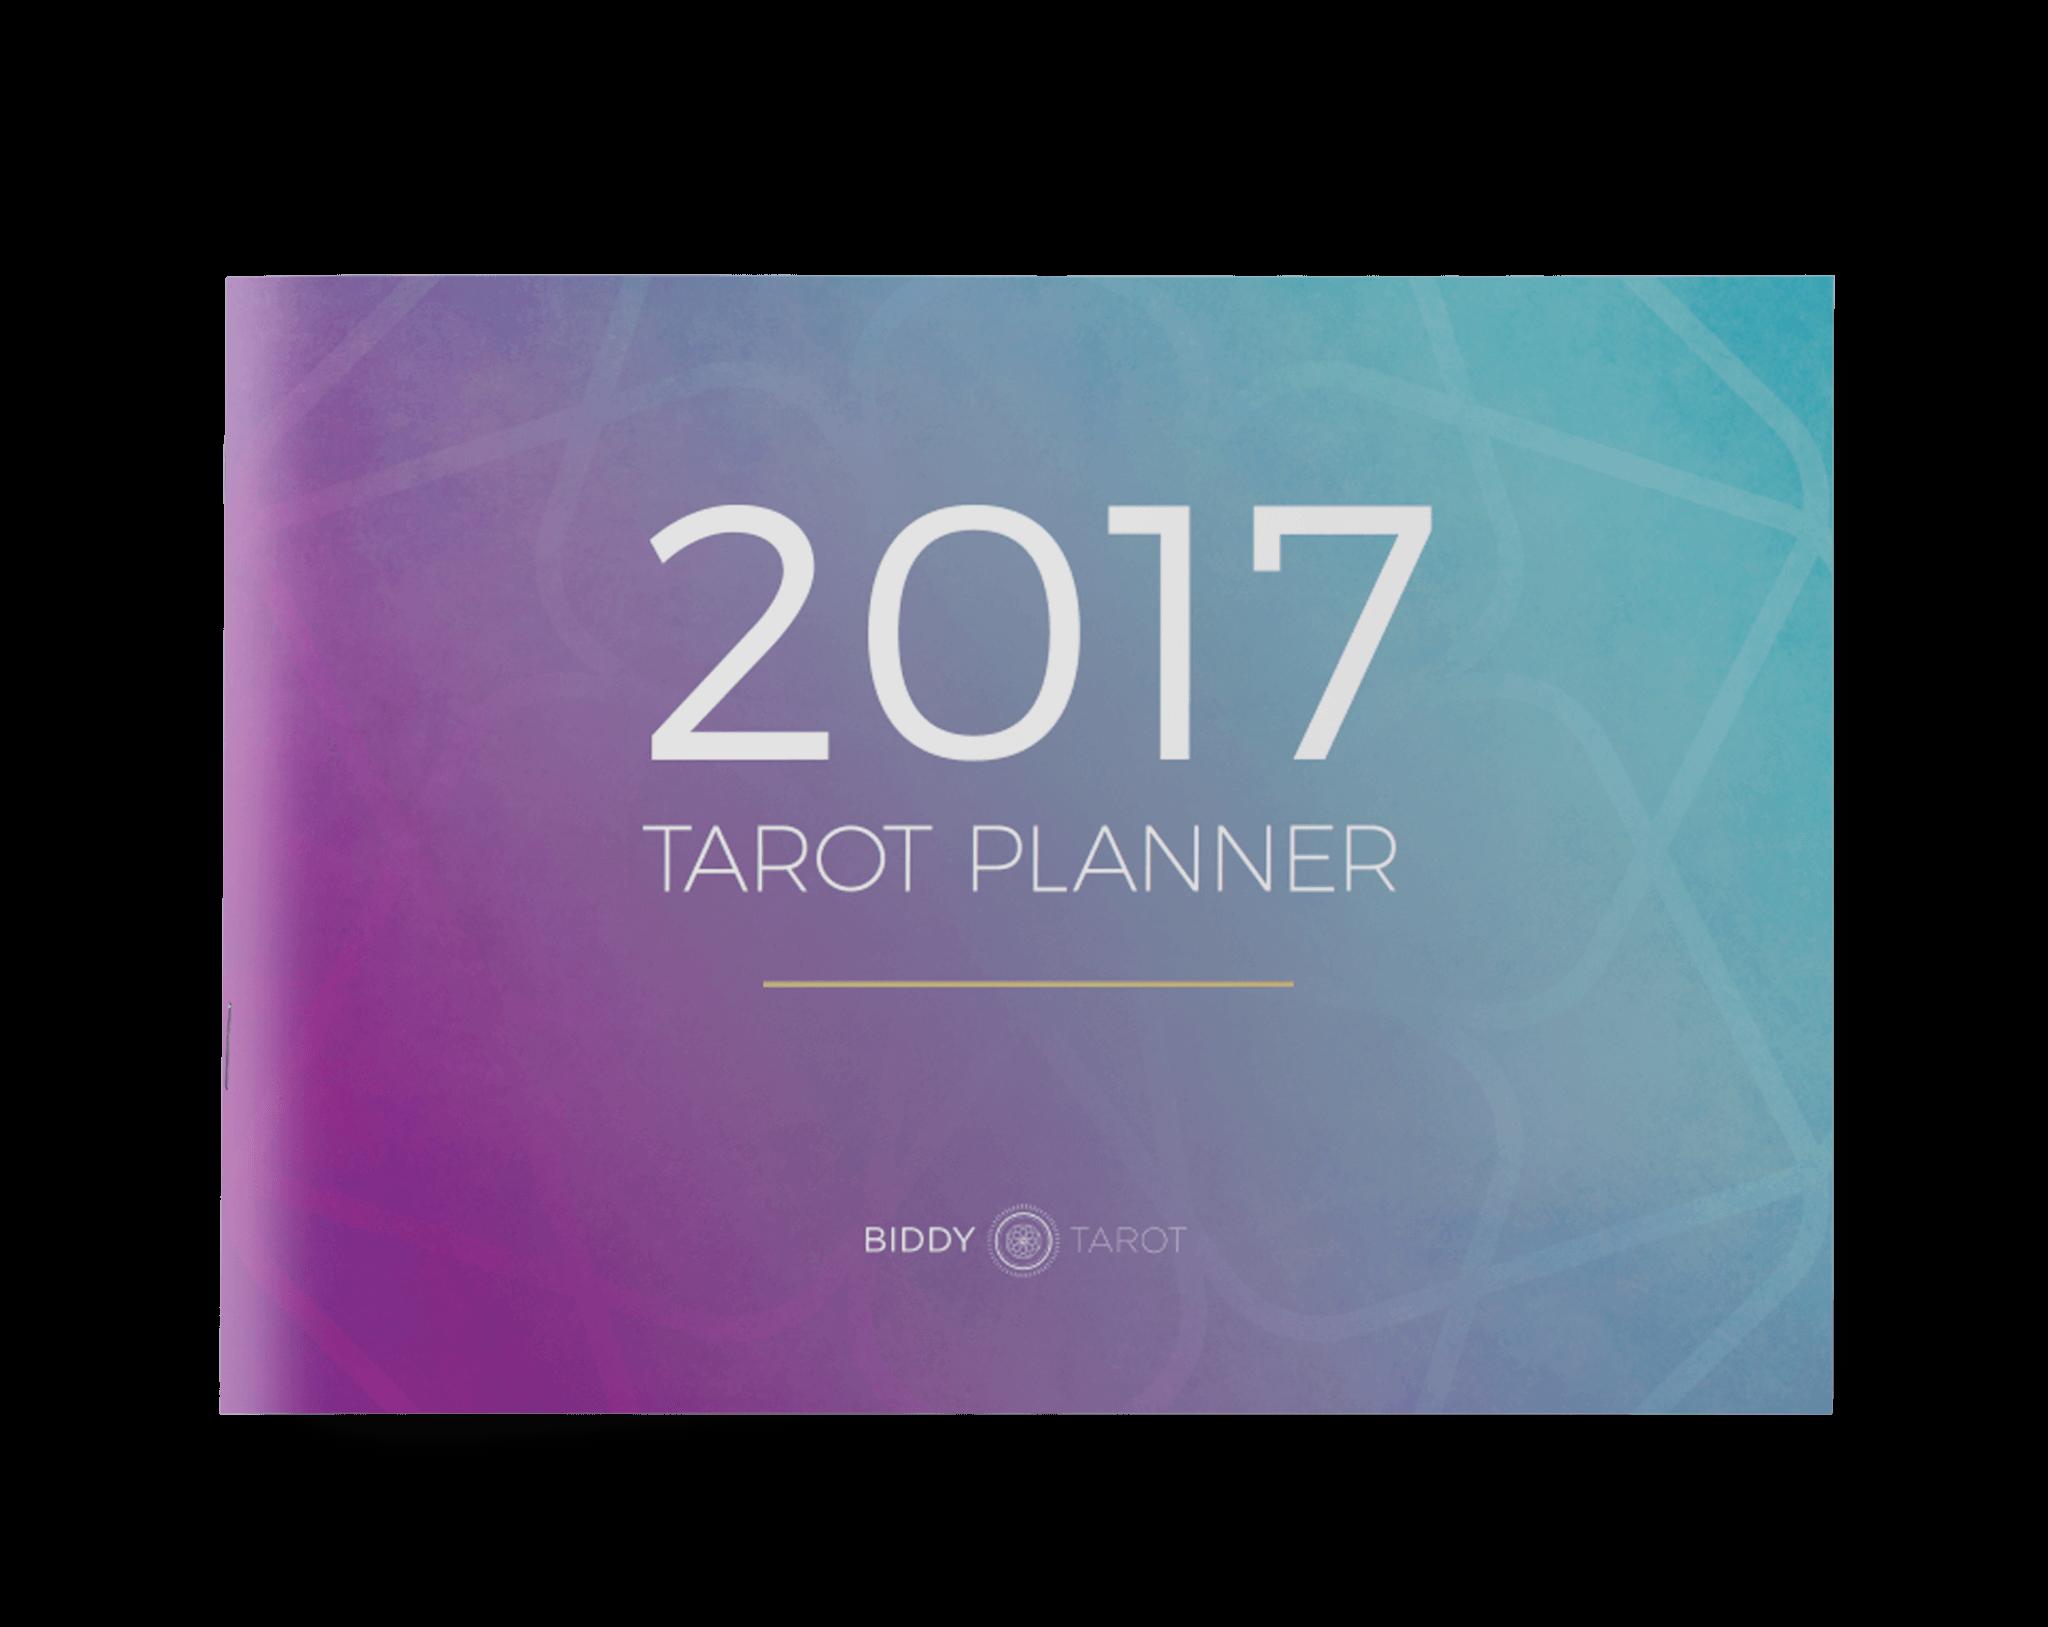 2017 Tarot Planner